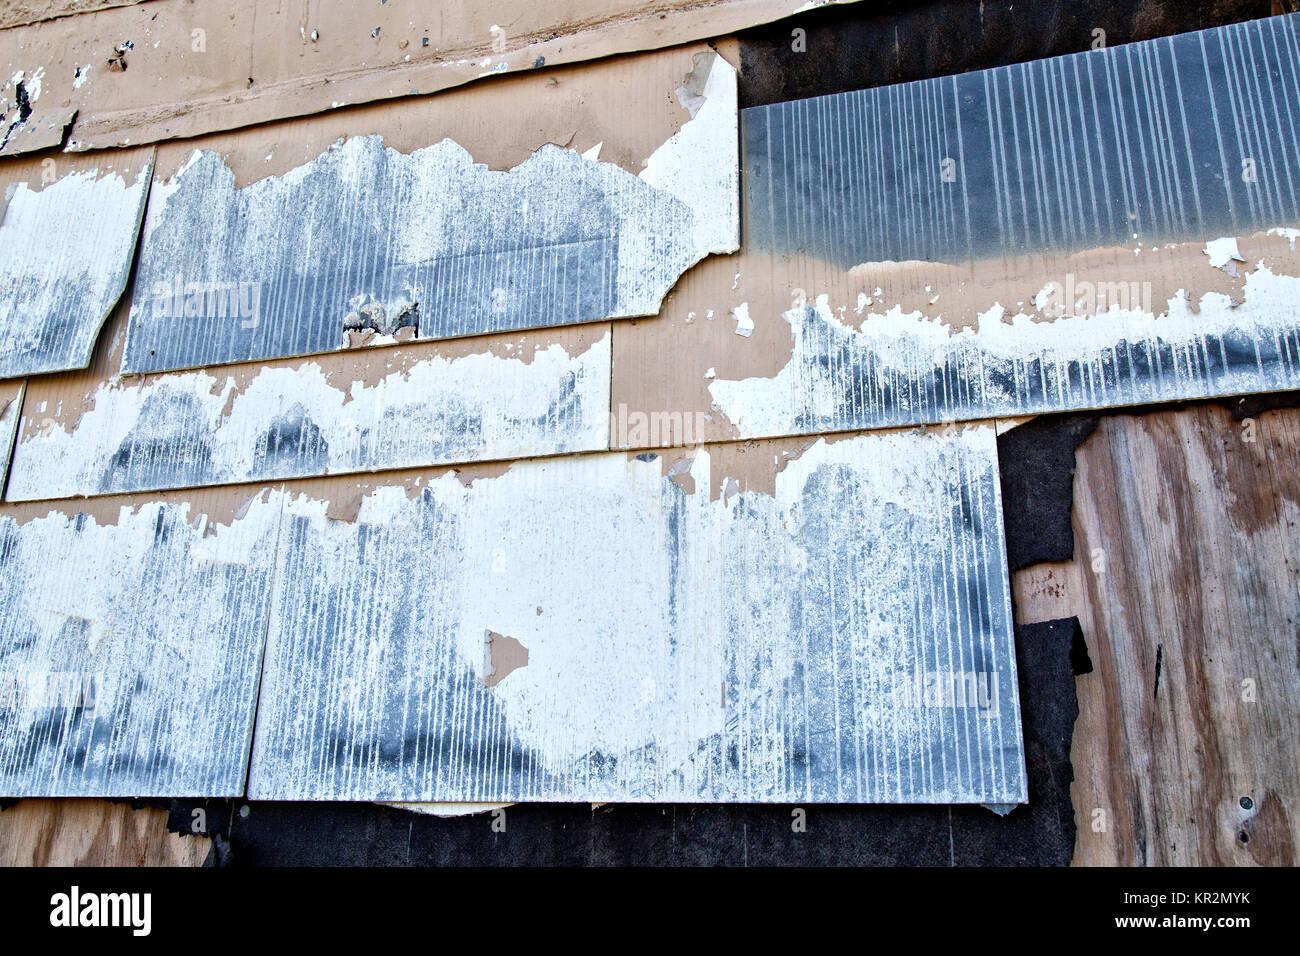 Asbestos Siding Stock Photos Asbestos Siding Stock Images Alamy